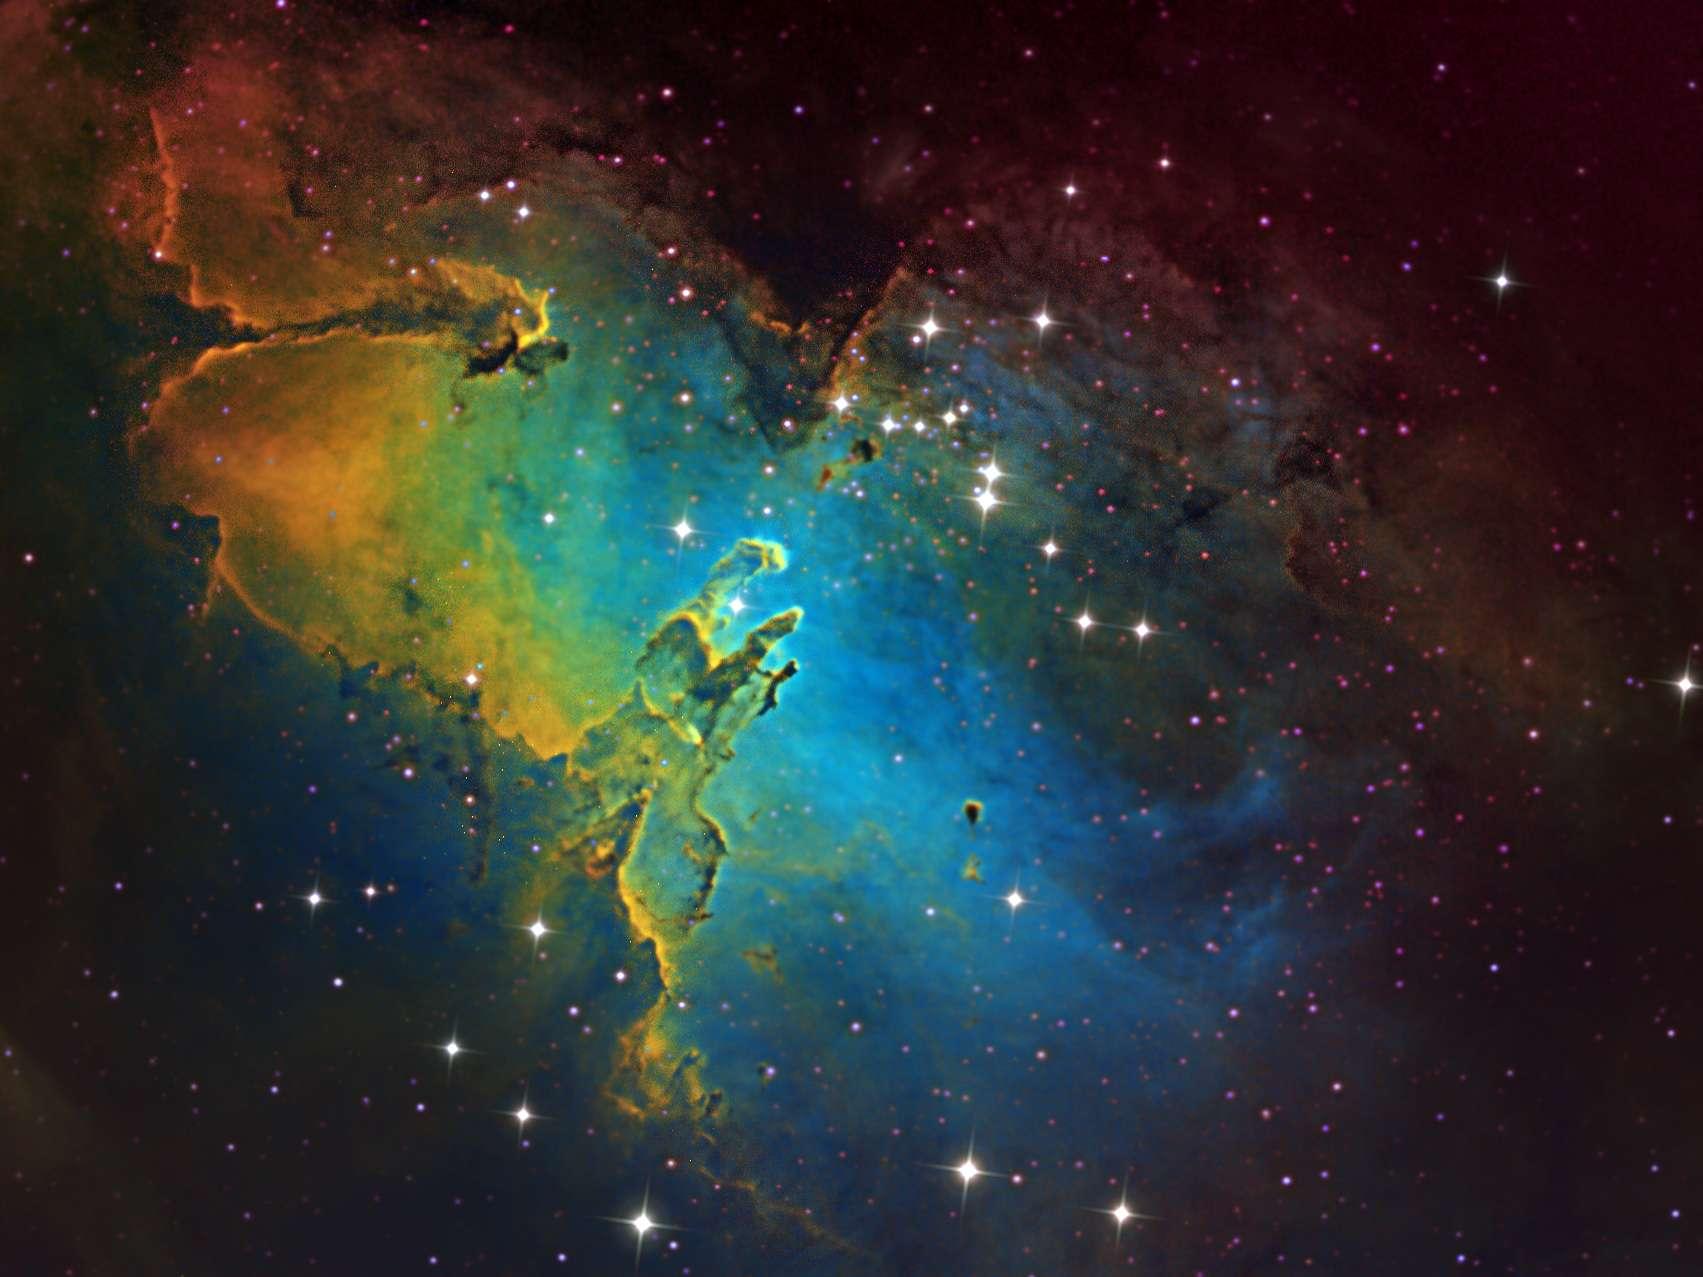 m16 eagle nebula face - photo #12